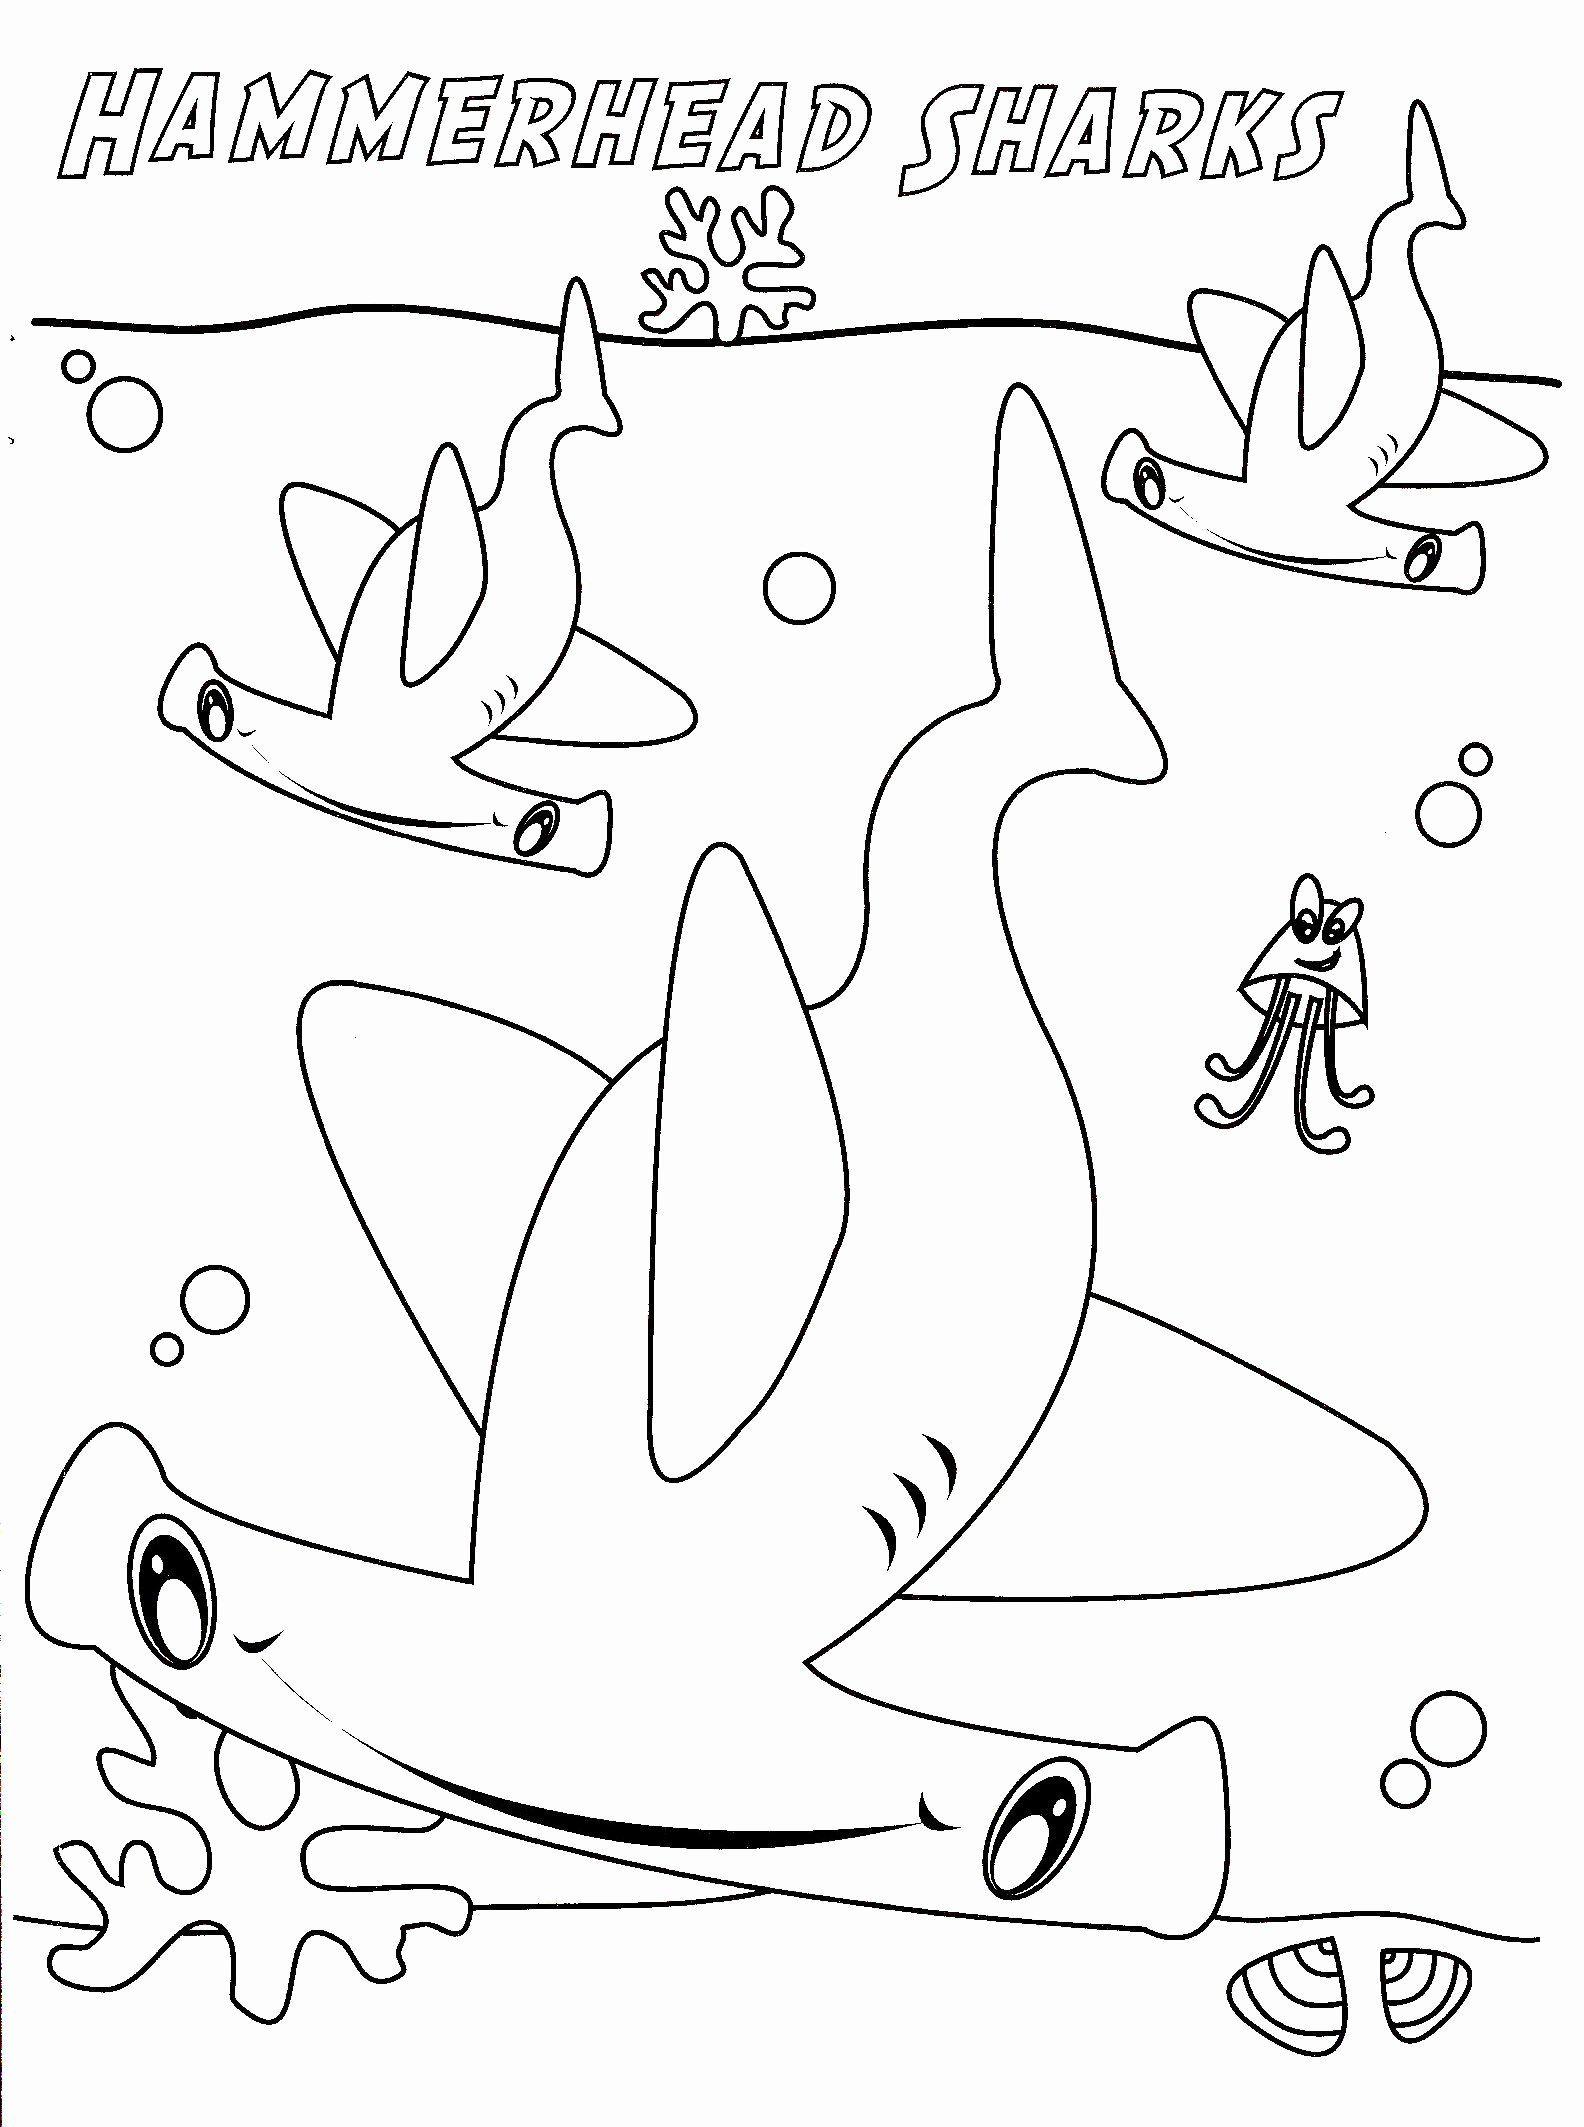 Hammerhead Shark Coloring Page Fresh Hammerhead Shark Drawing At Getdrawings In 2020 Shark Coloring Pages Coloring Pages Nemo Coloring Pages